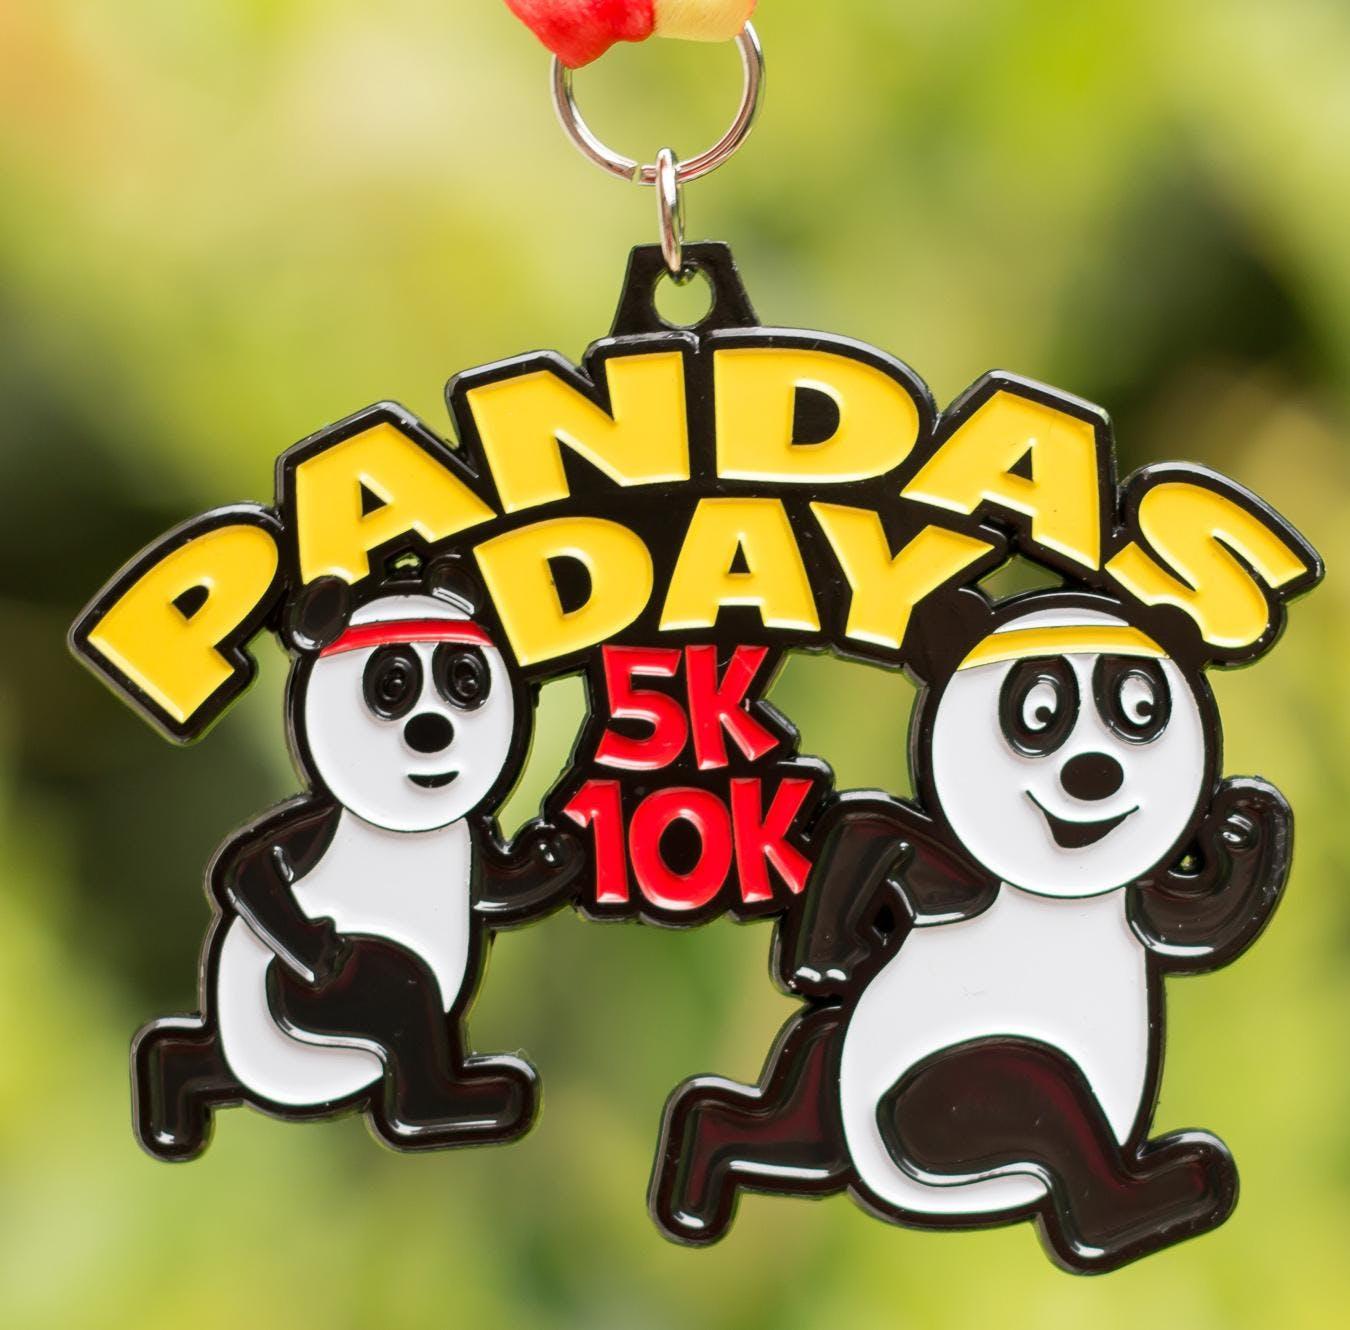 Now Only $10! PANDAS Day 5K & 10K - Tucson